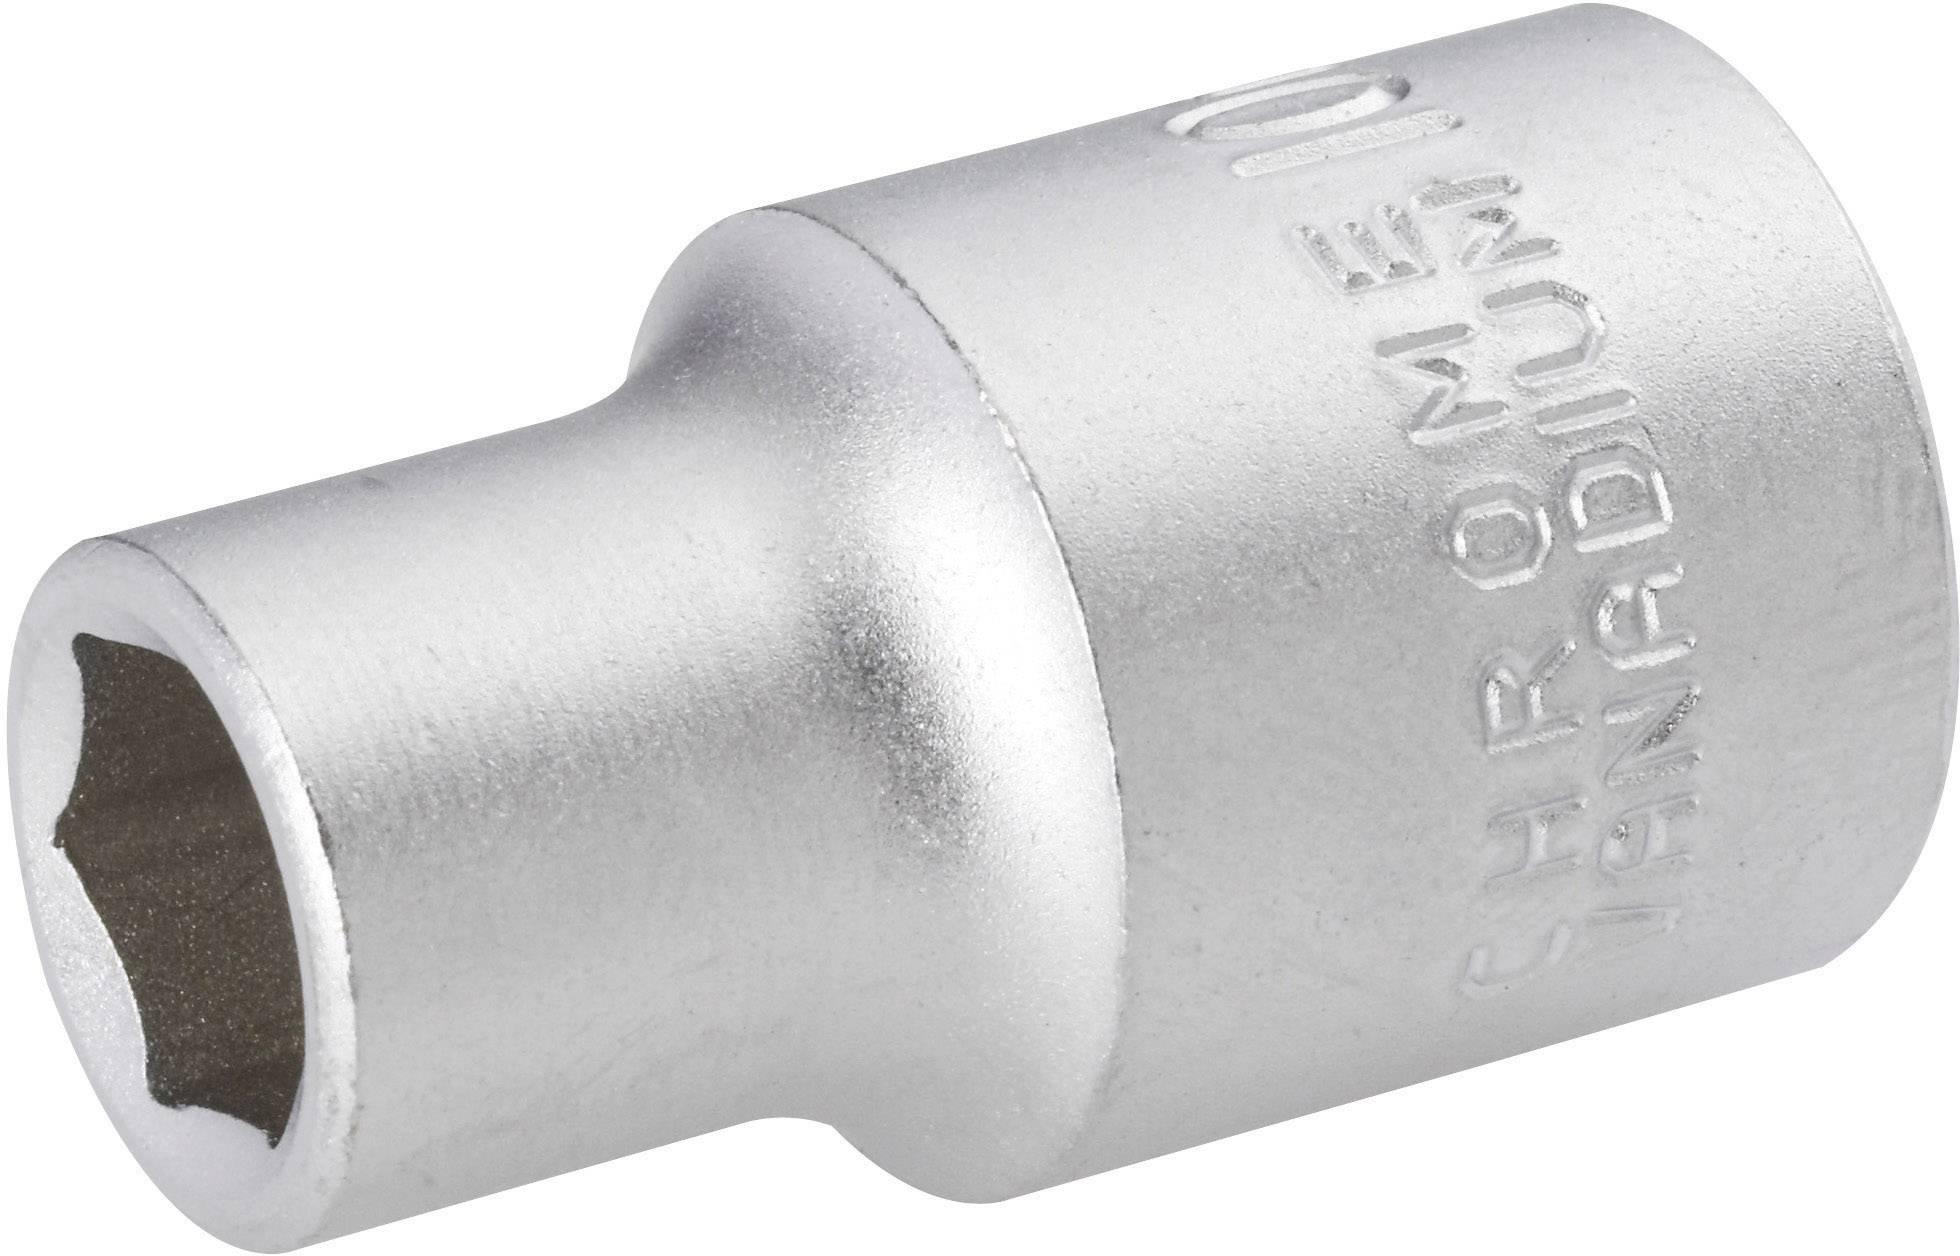 "Nadstavec na račňu TOOLCRAFT 820775, 1/2"" (12.5 mm), 21 mm"